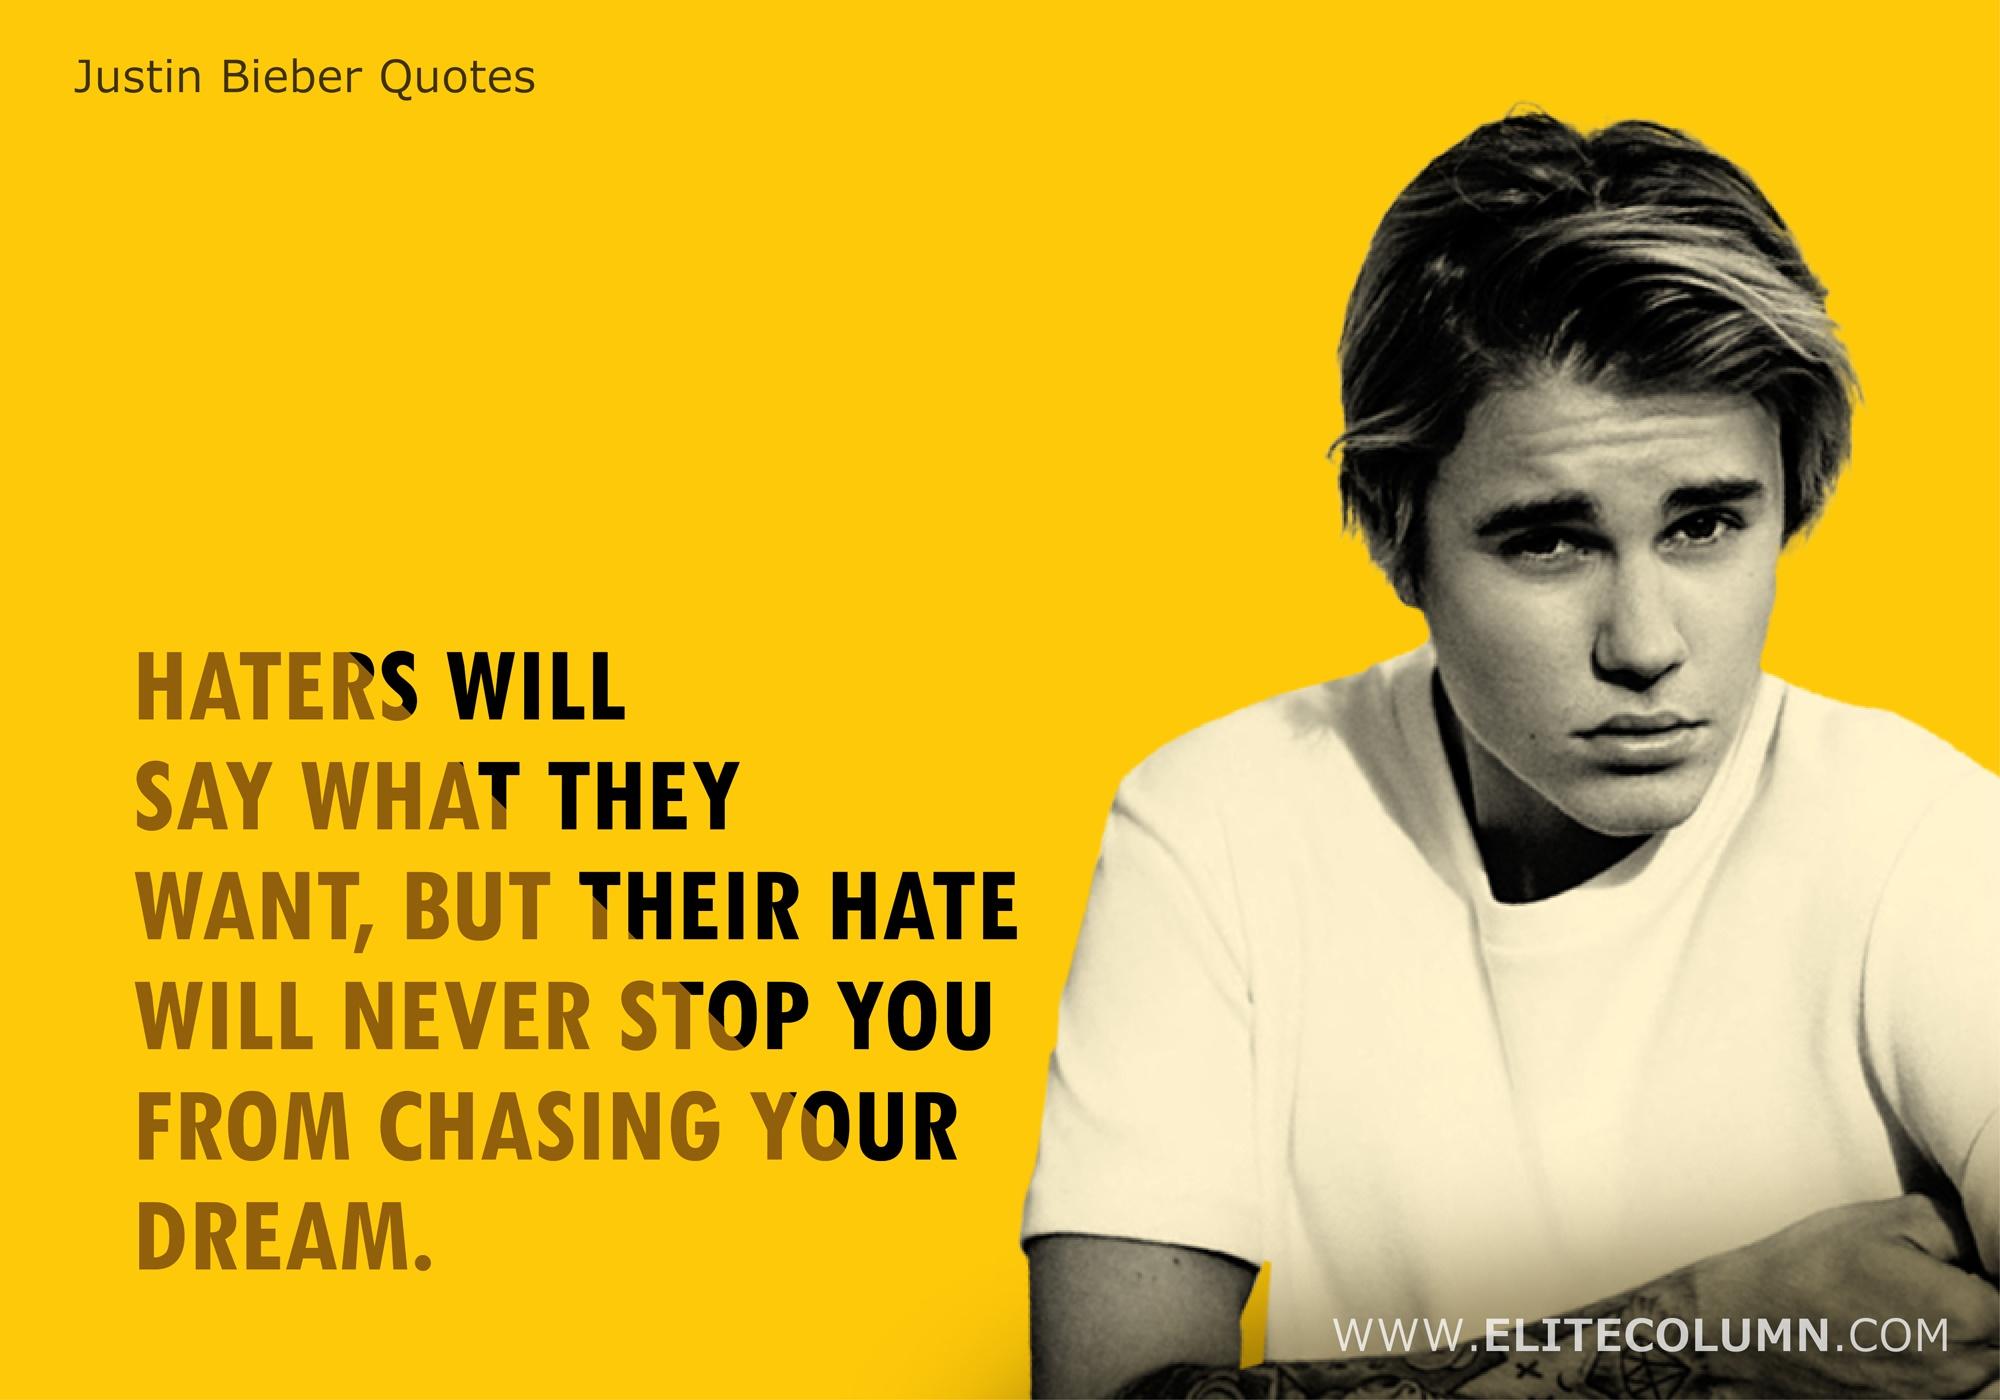 Justin Bieber Quotes (5)